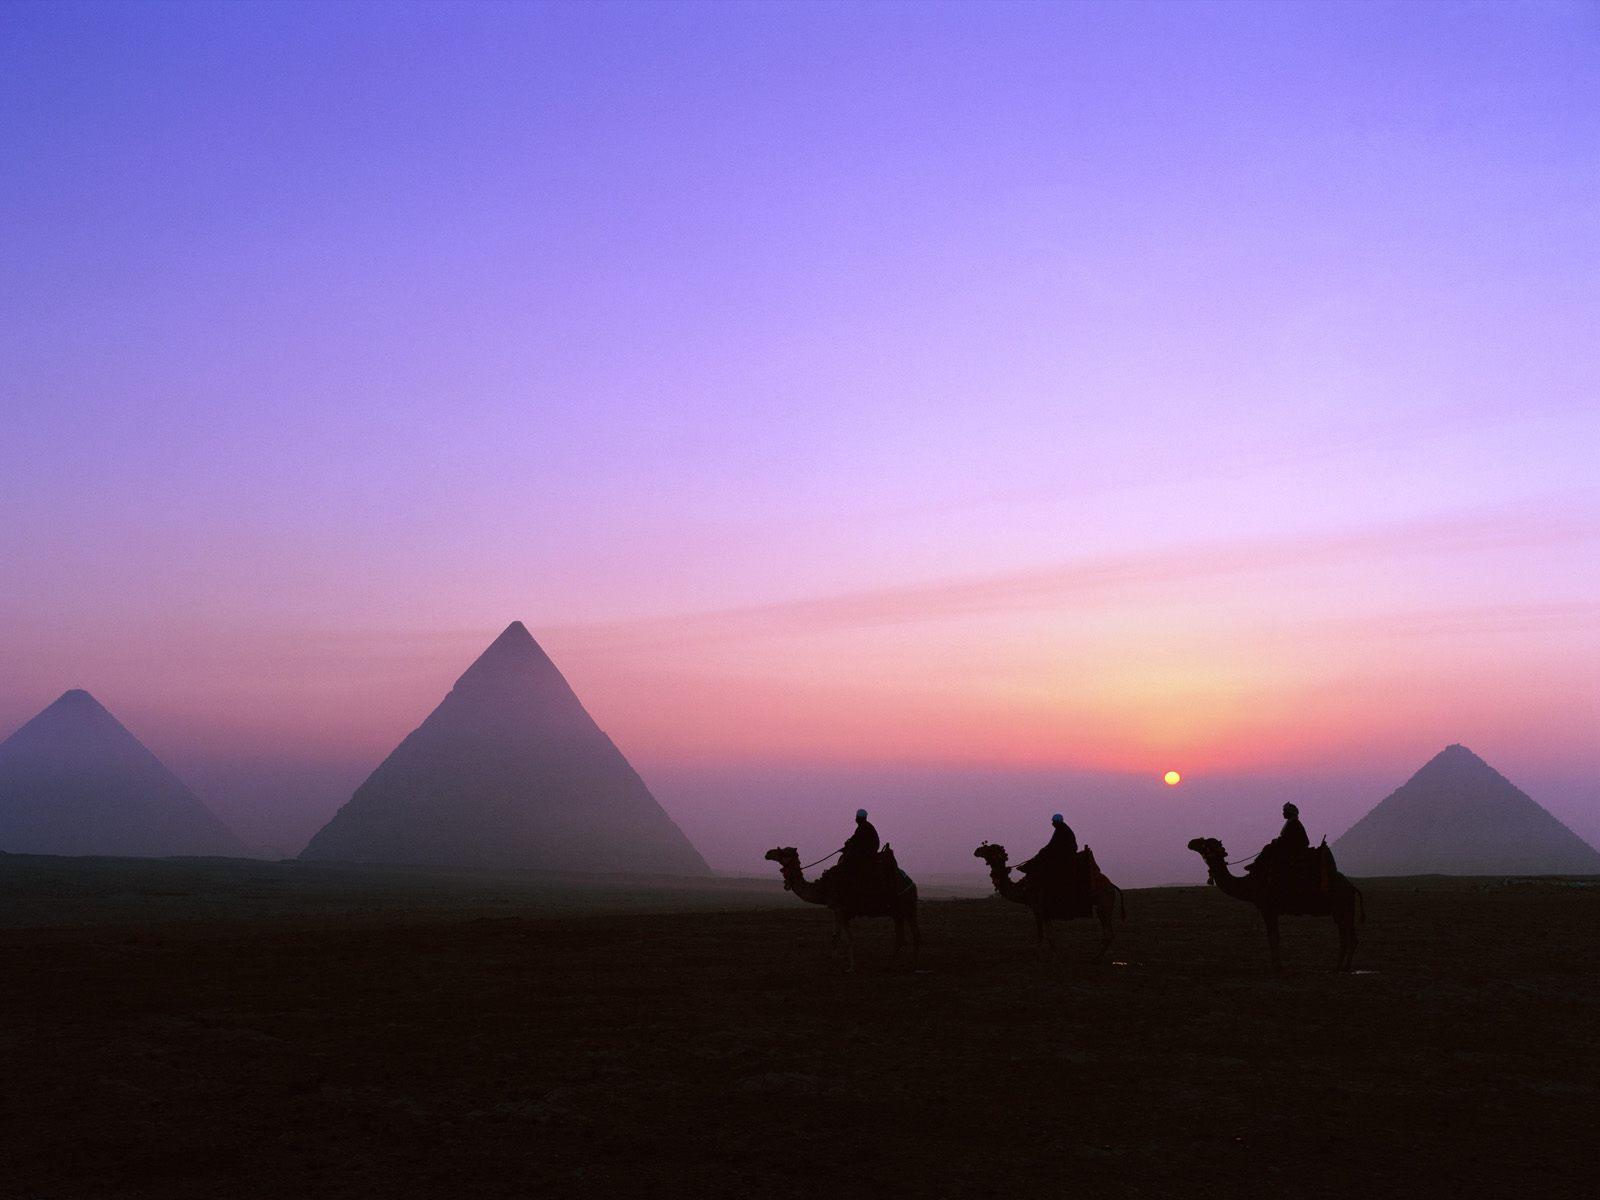 Egypt Mystic Journey hd Wallpaper | High Quality Wallpapers,Wallpaper ...